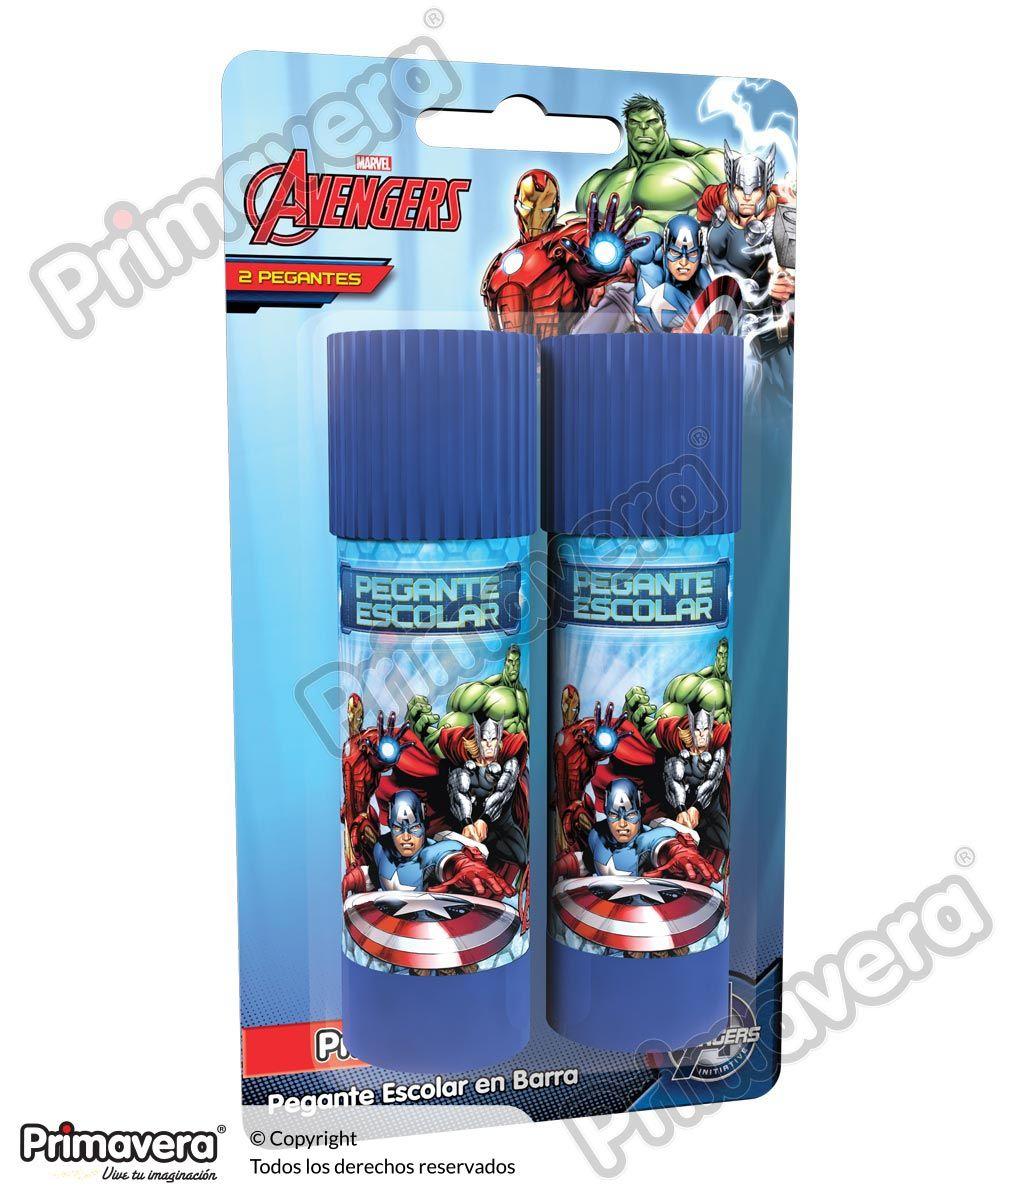 Pegante en Barra X 2 Avengers http://escritura.papelesprimavera.com/product/pegante-en-barra-x-2-avengers-primavera/